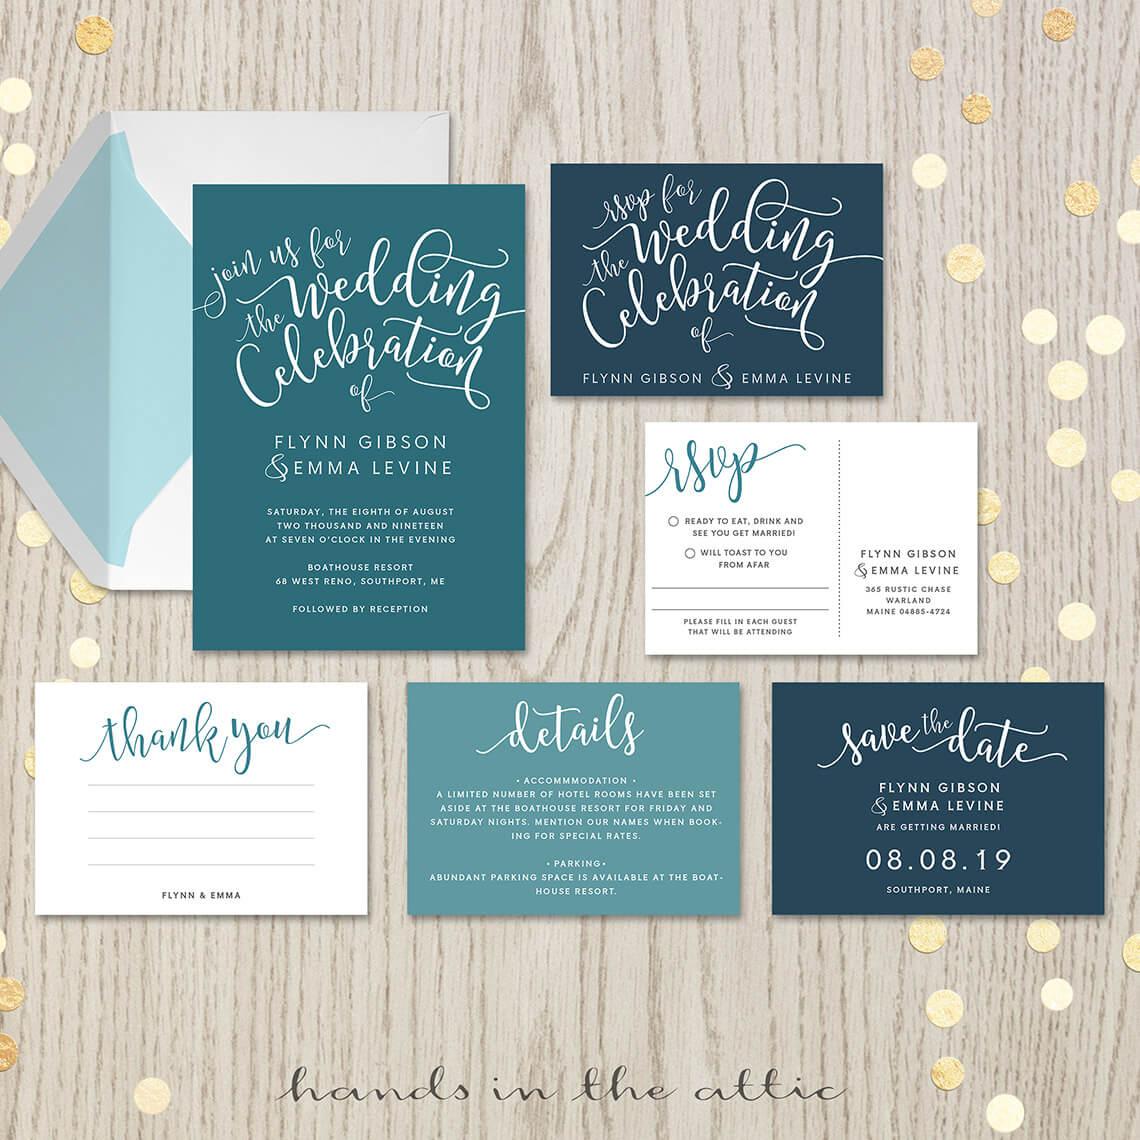 Cheap Wedding Invitations Sets: Teal Wedding Invitation Set